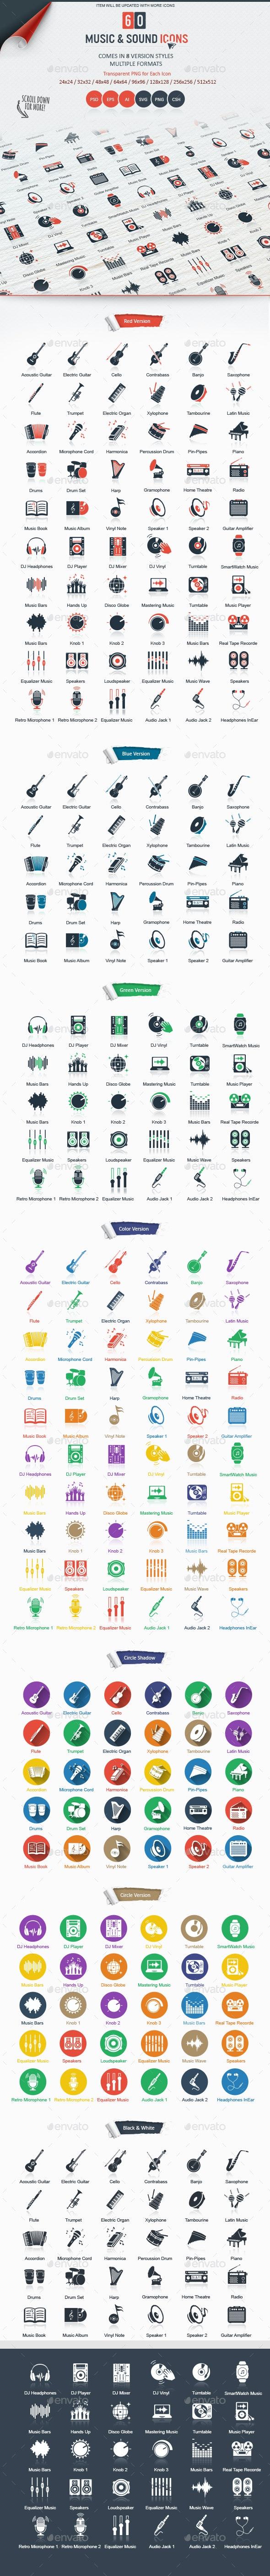 Music & Sound Icons - Media Icons